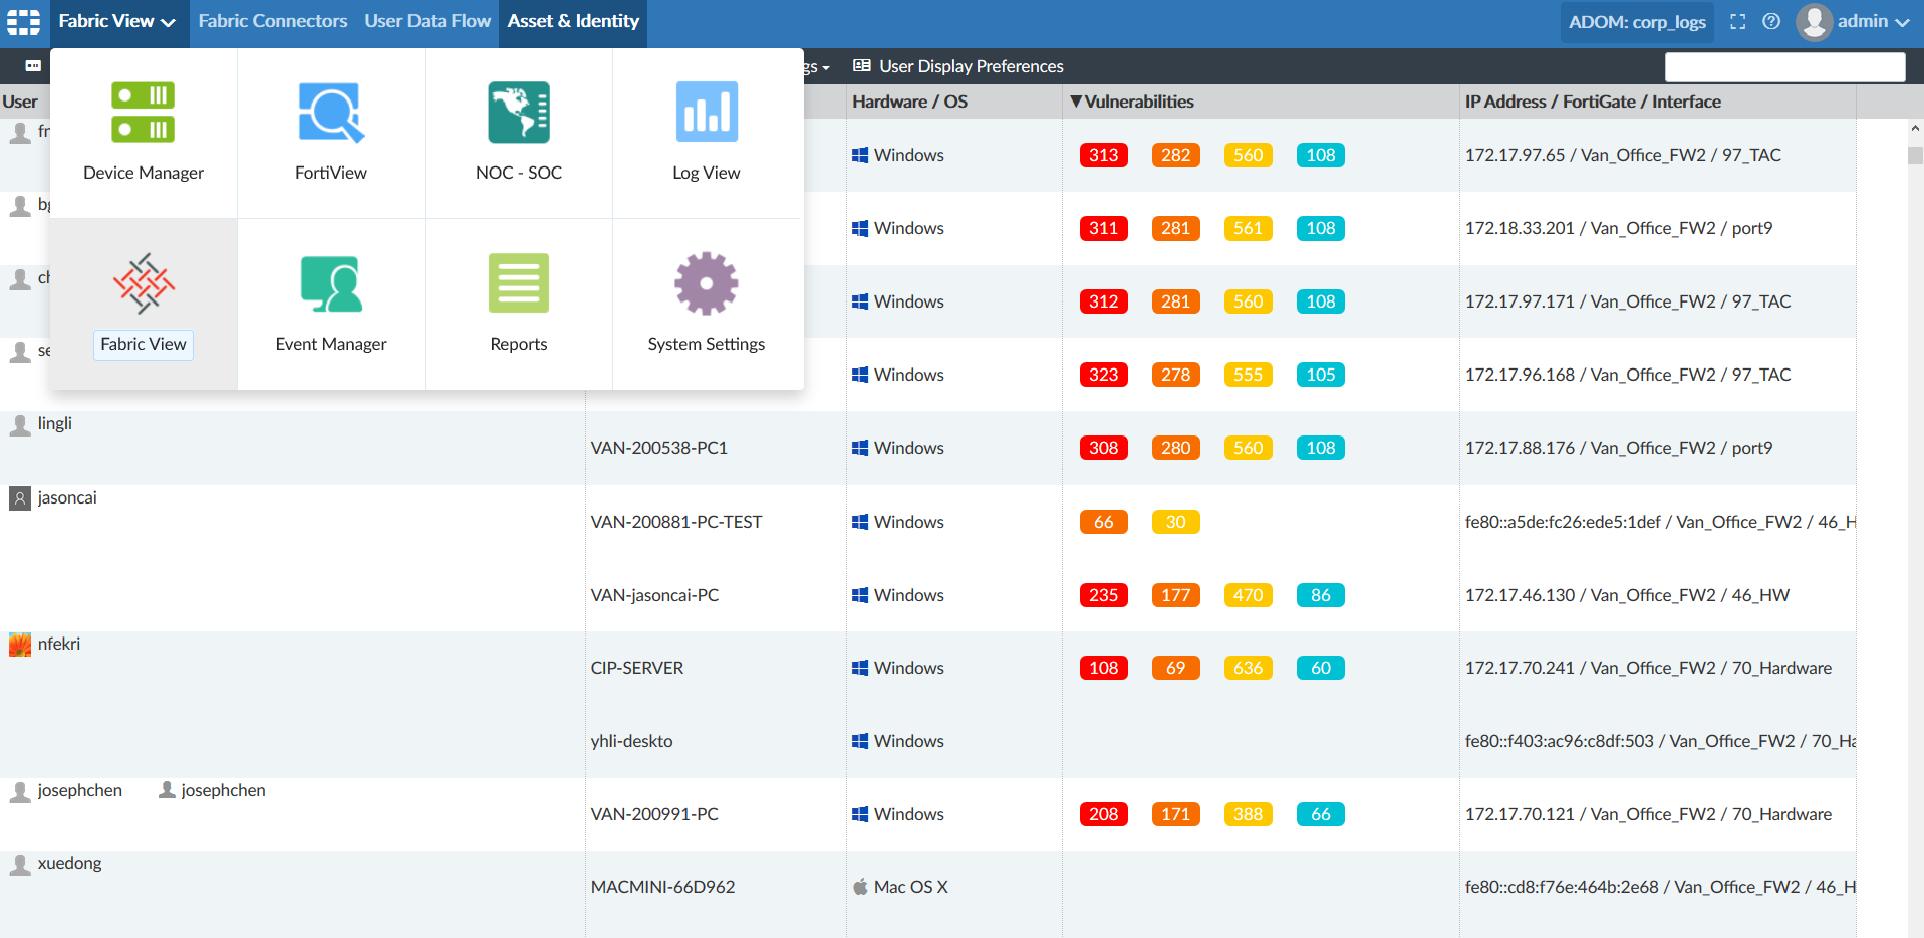 Screenshot displaying Asset & Identity Center